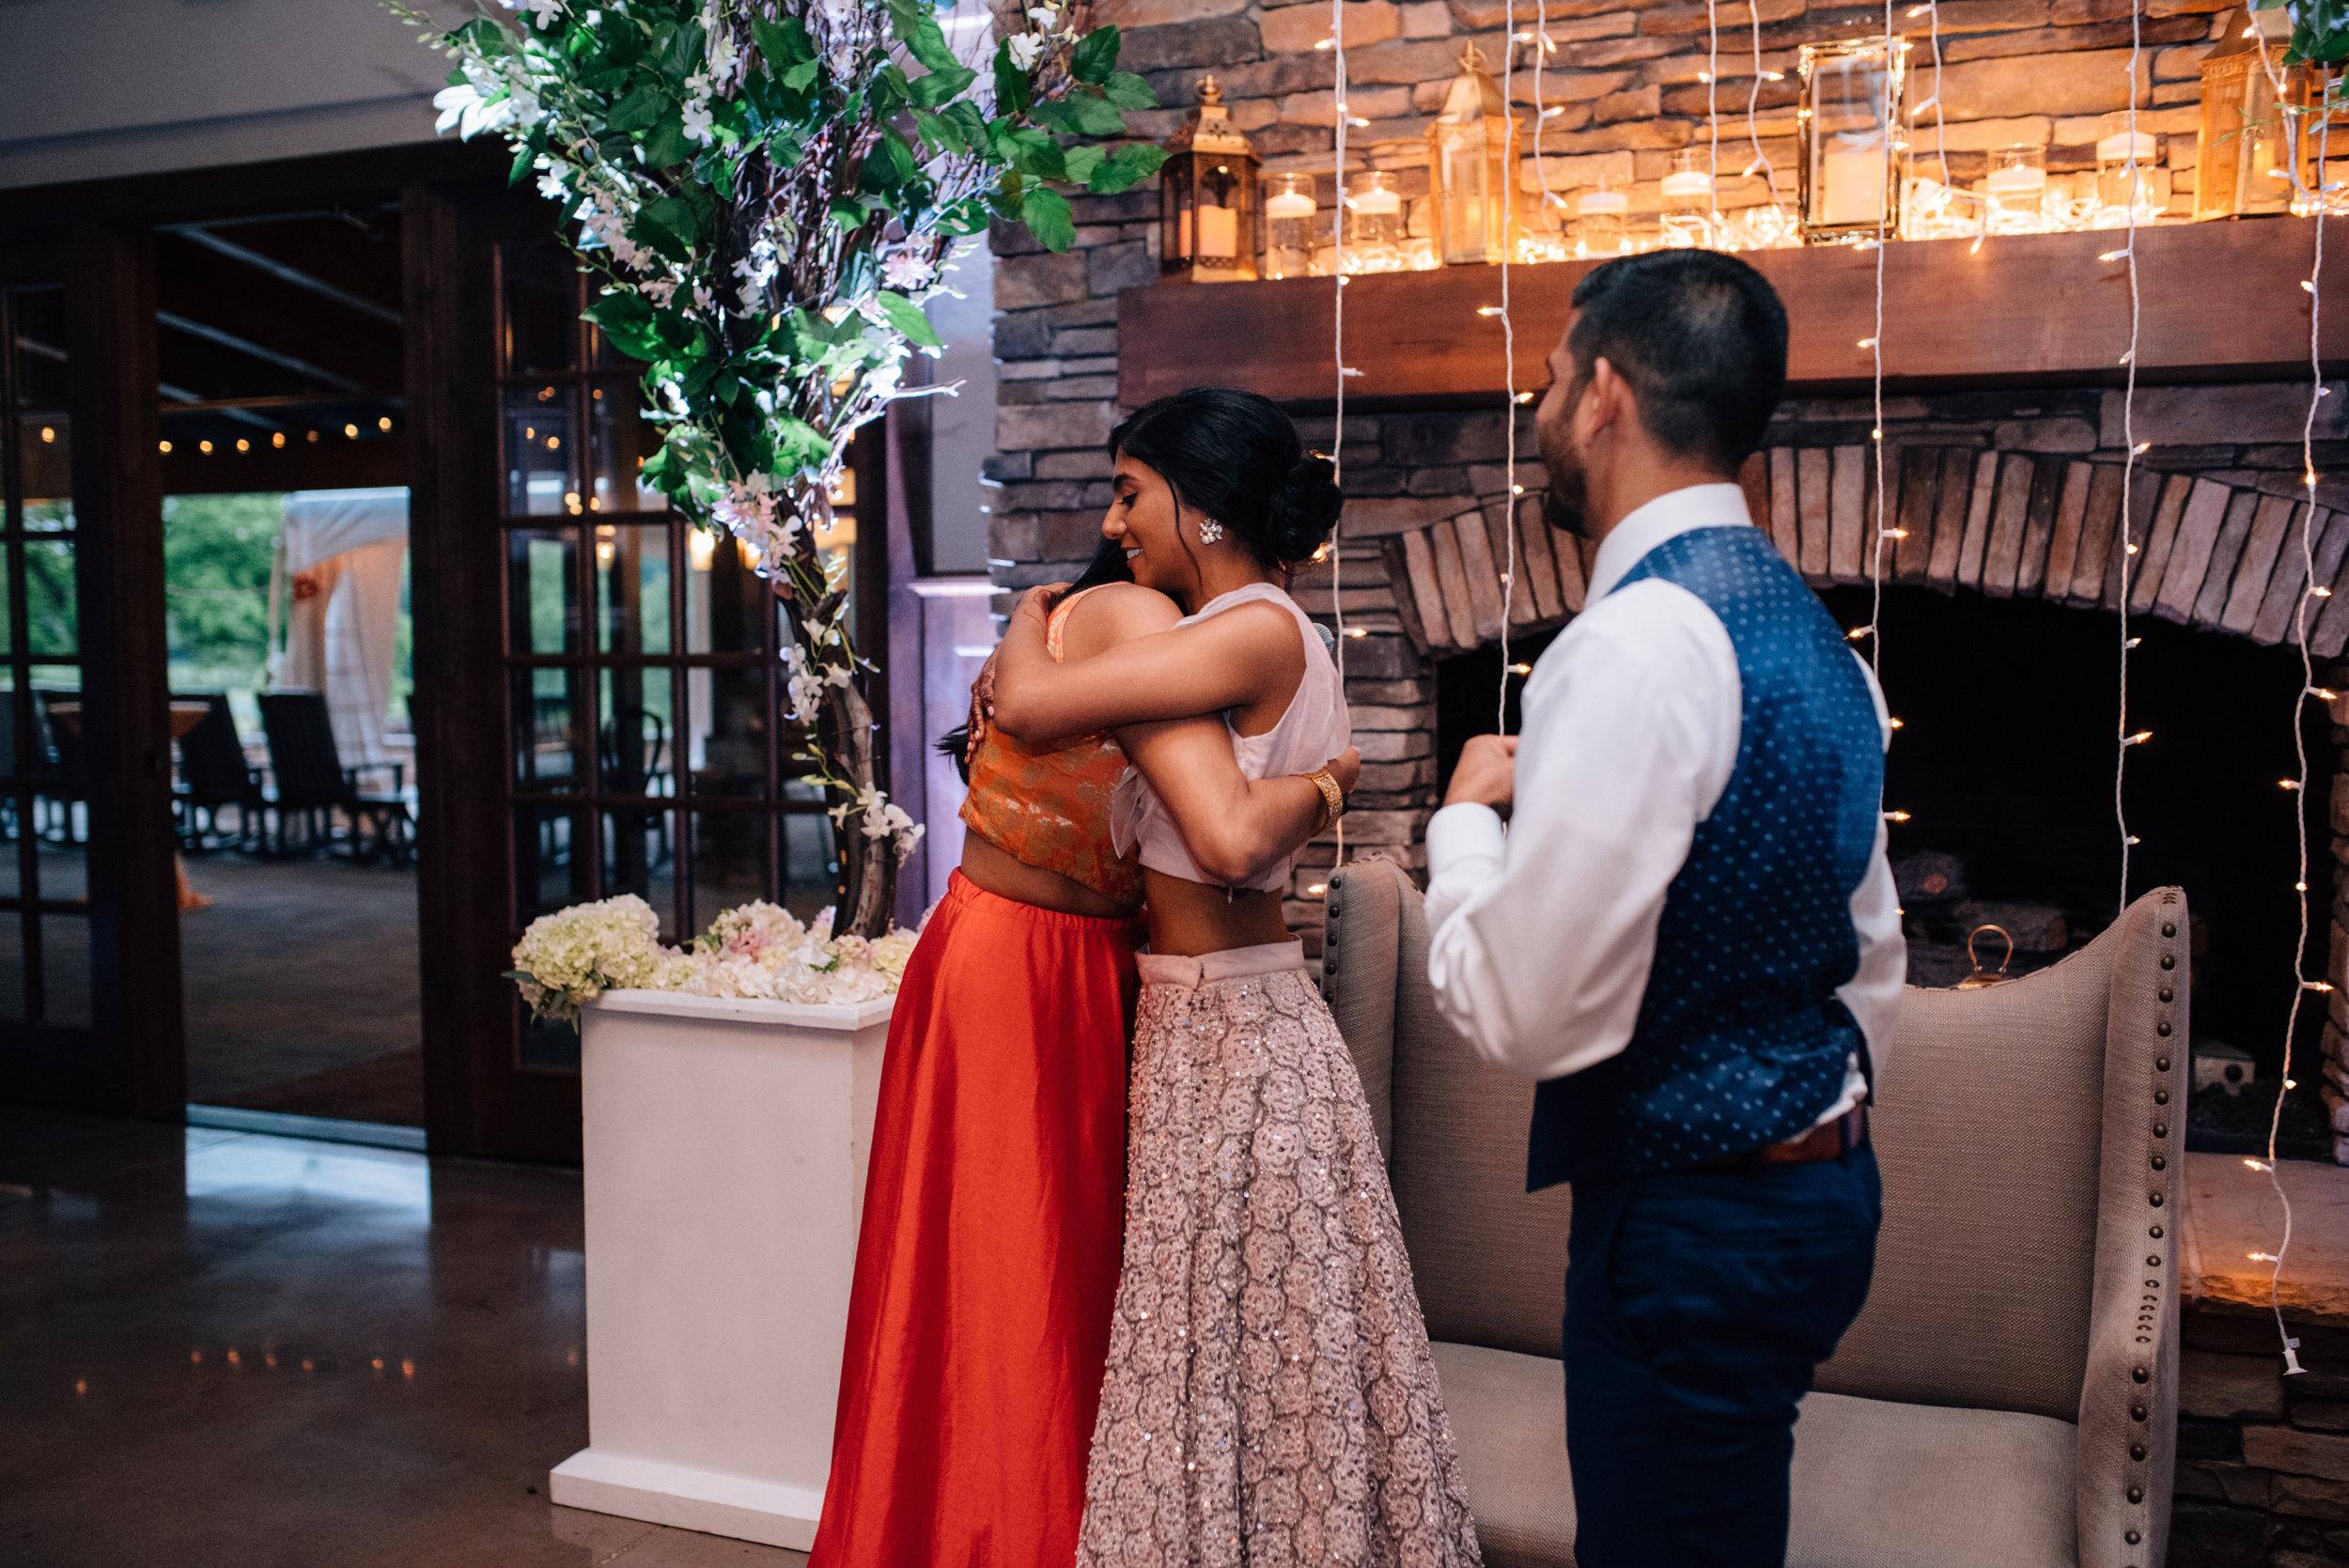 Indian Fusion Wedding - North Carolina Wedding Photographer - North Carolina Indian Wedding Photographer - The Addison Farm Wedding - Greensboro Wedding Photographer - Raleigh Wedding Photographer